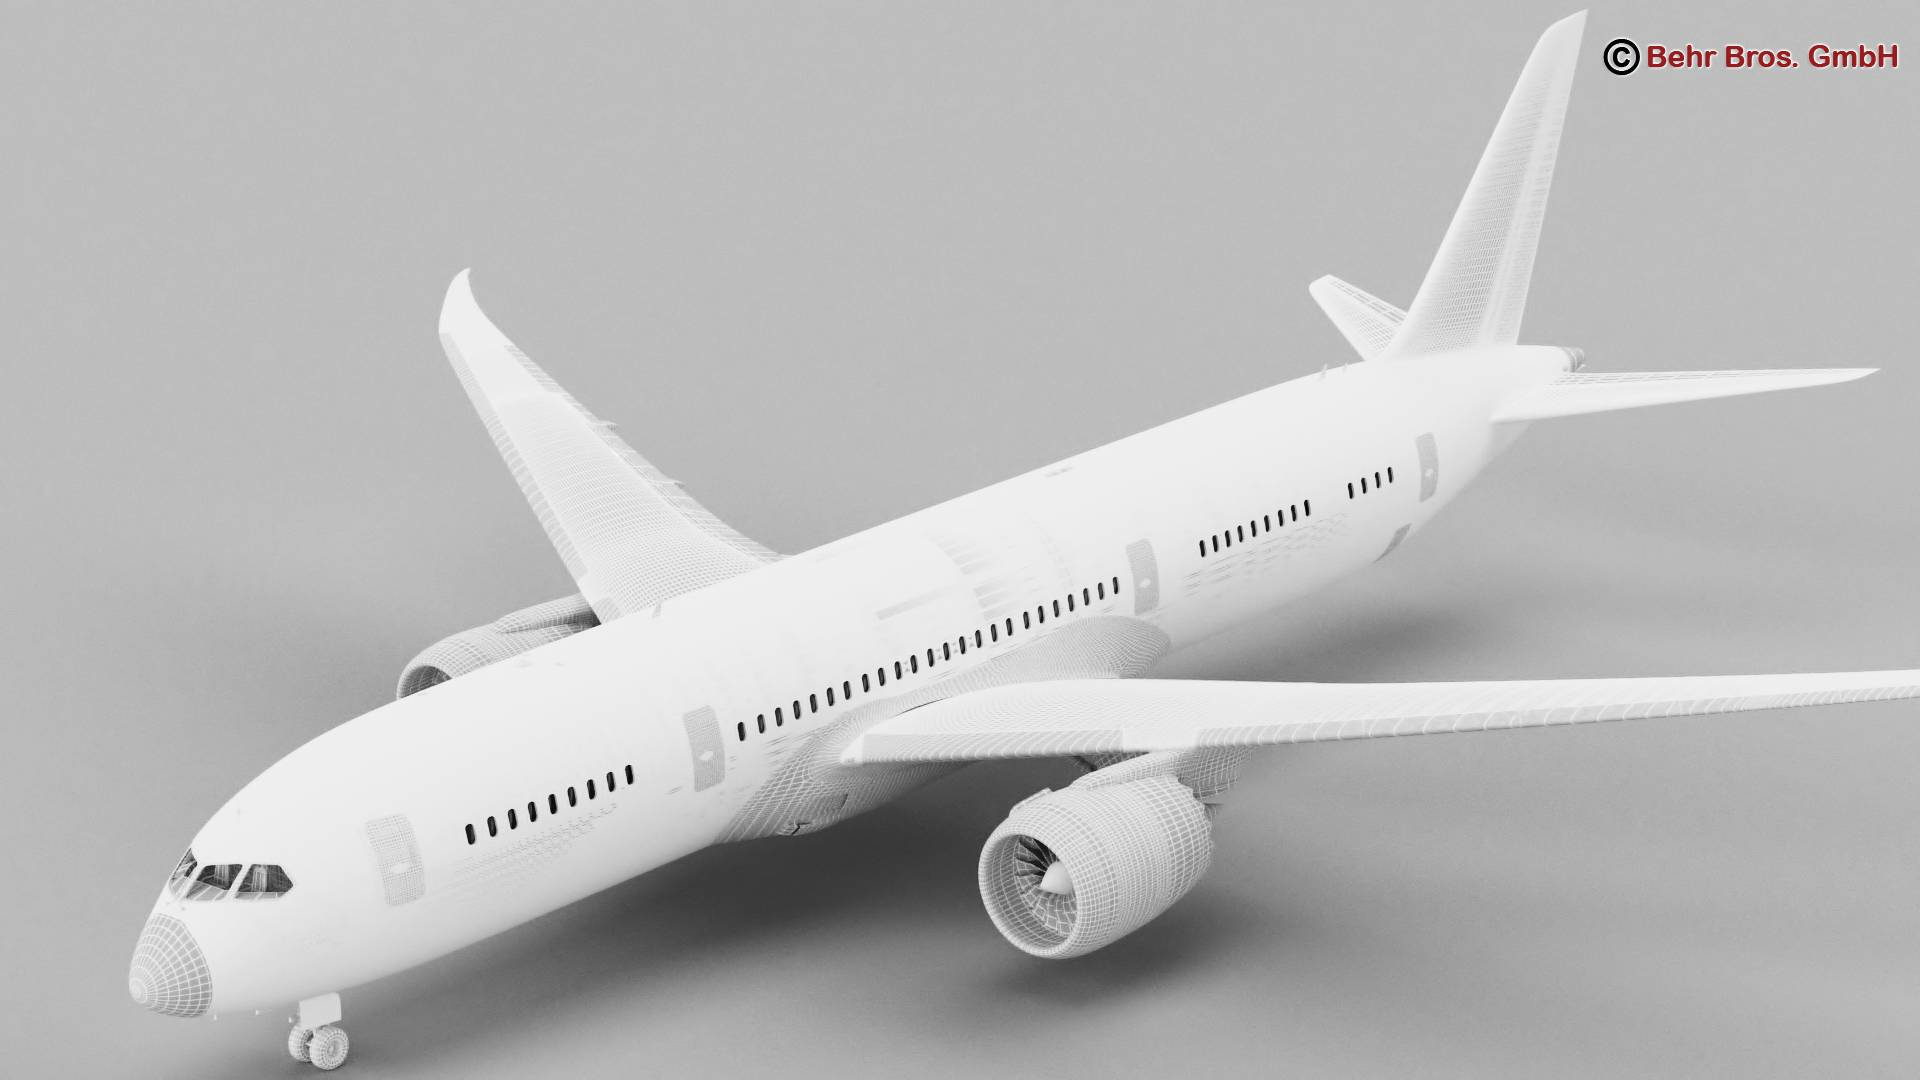 boeing 787-8 3d model 3ds max fbx c4d lwo ma mb obj 251362